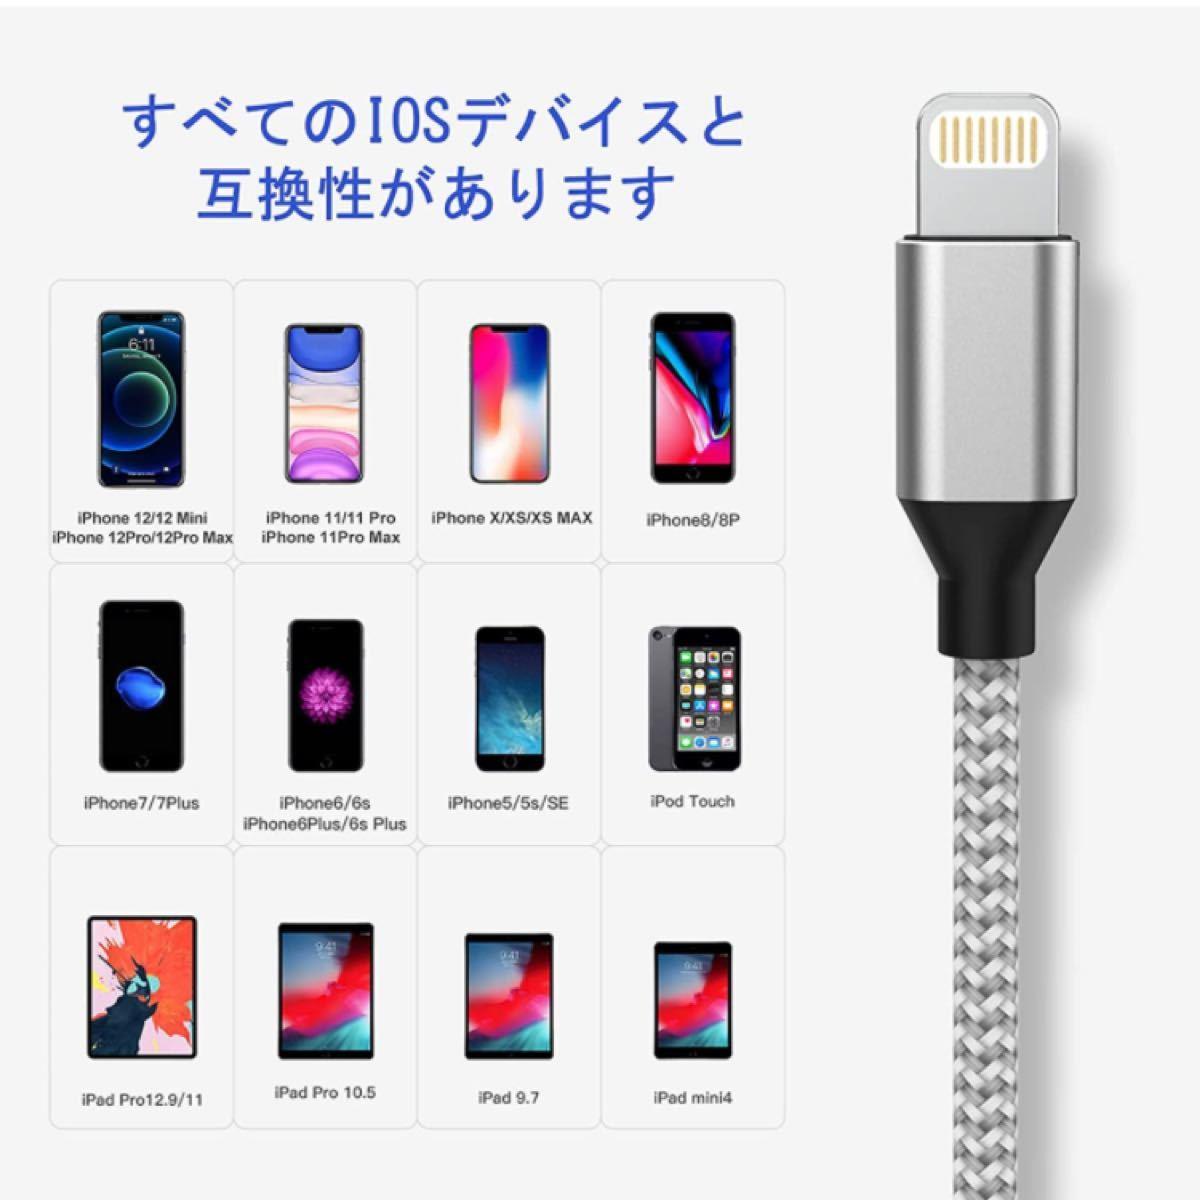 iPhone 充電ケーブルライトニングケーブル 超高耐久USB同期&充電 1m/1m2m/2m/3m 五本セット